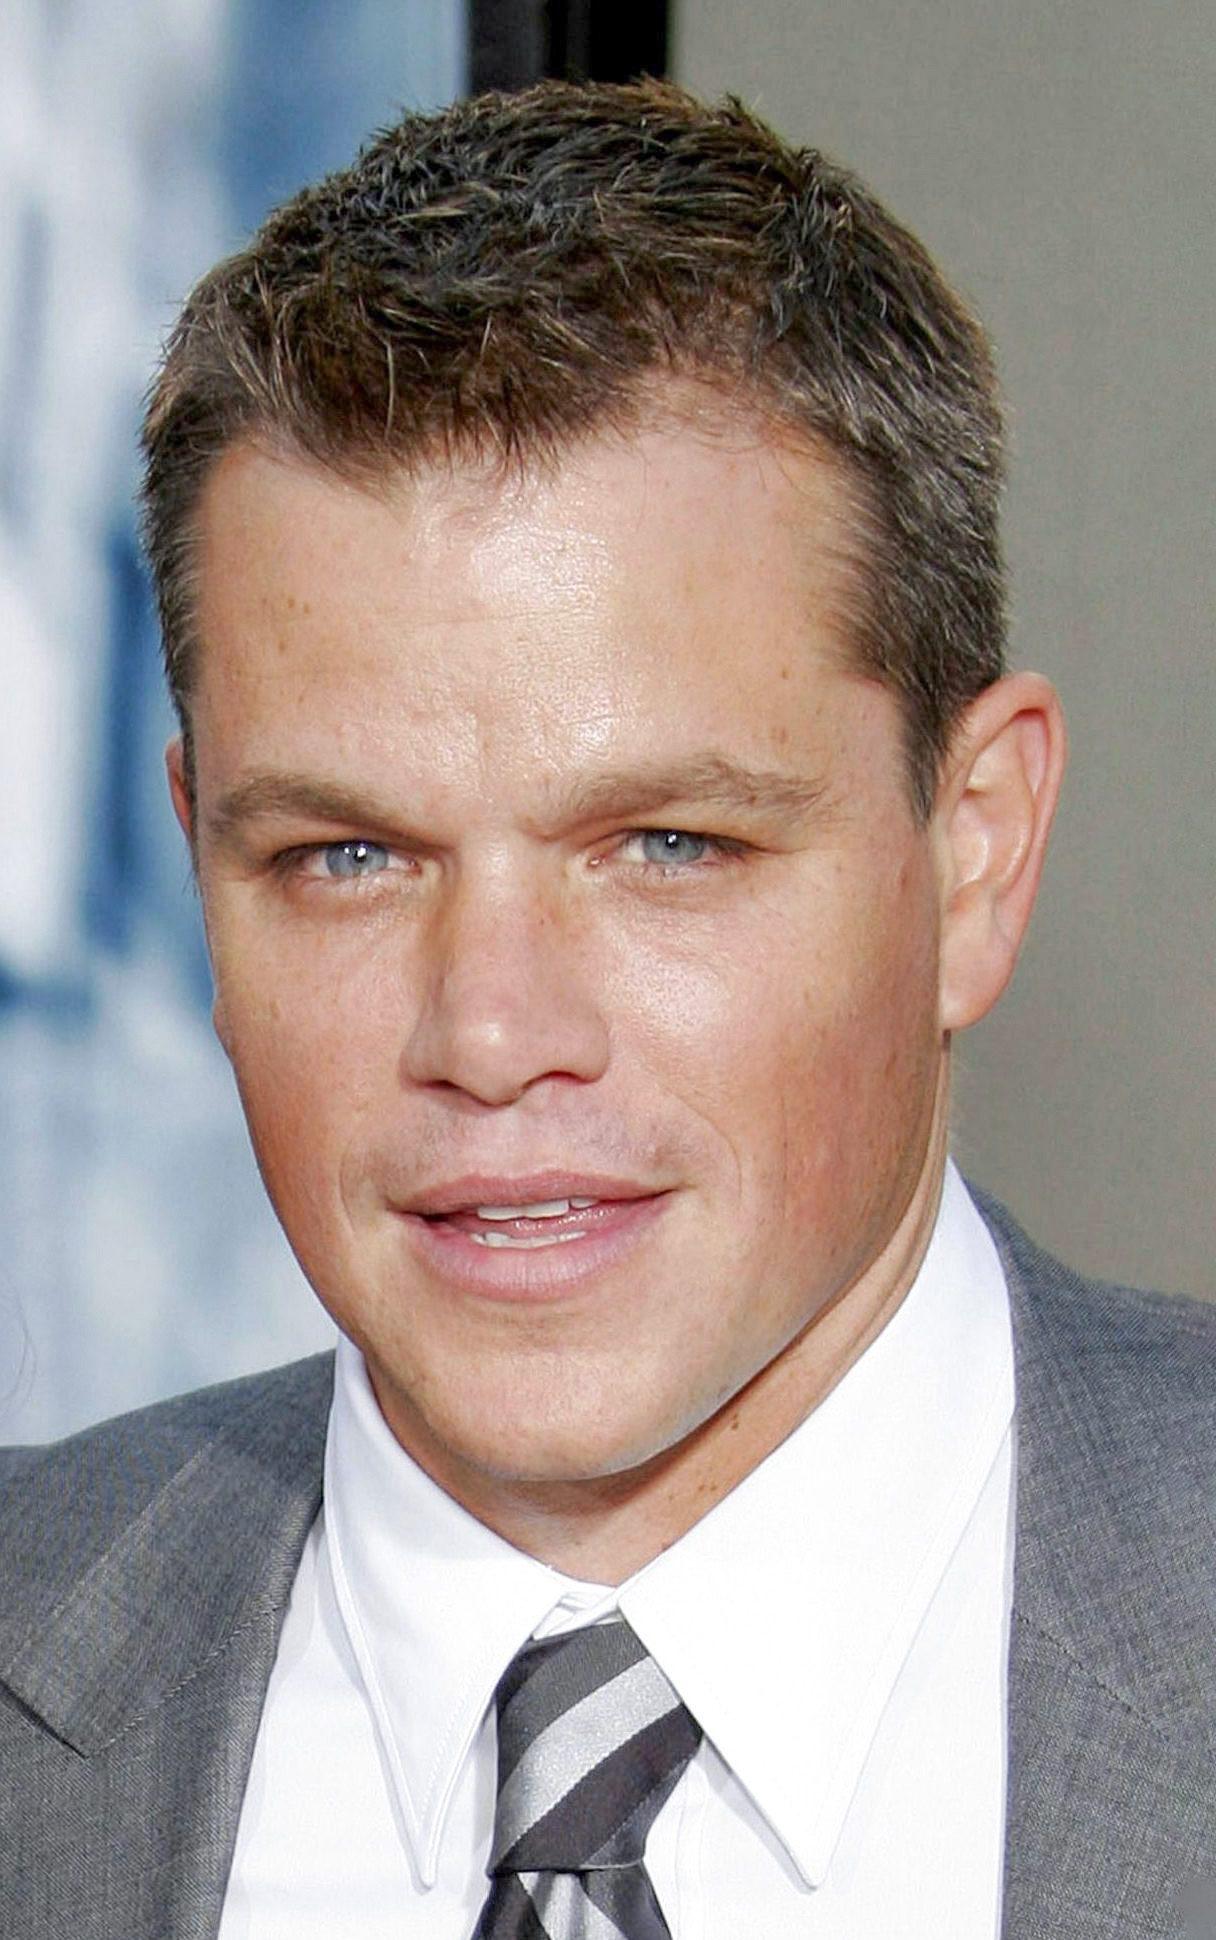 Matt Damon crew cut ivy league haircut